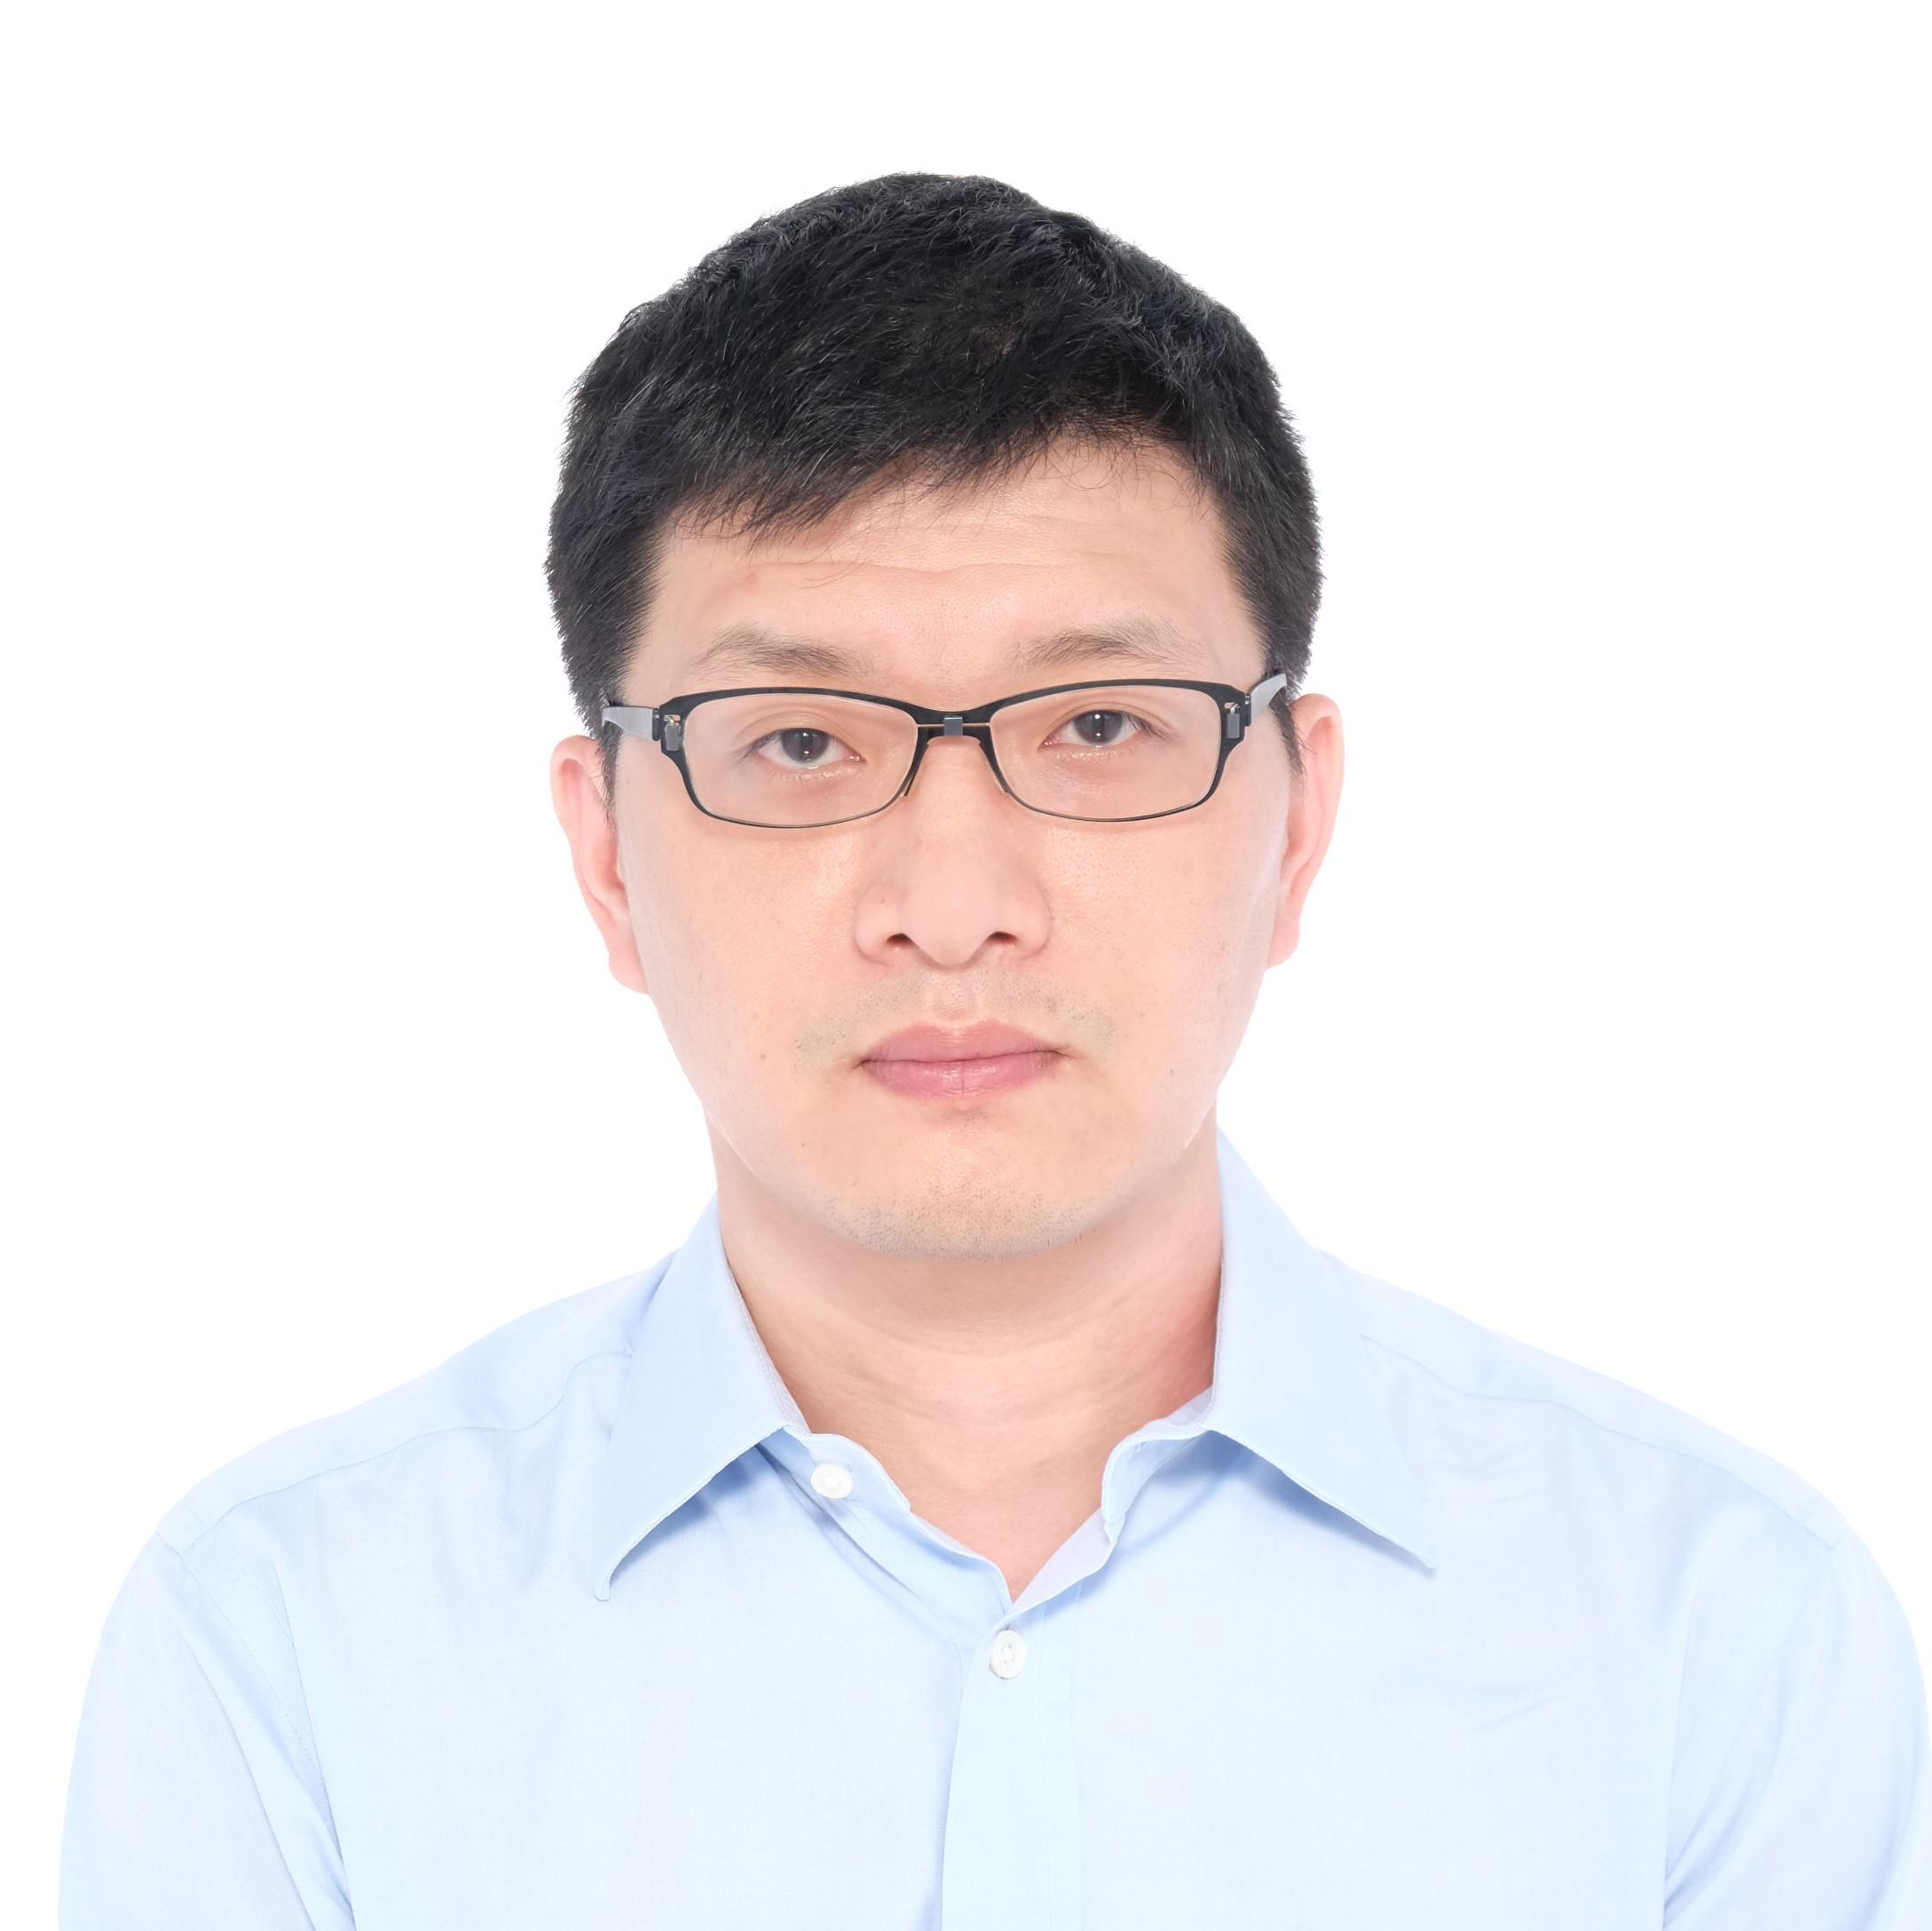 Zhenze Lin